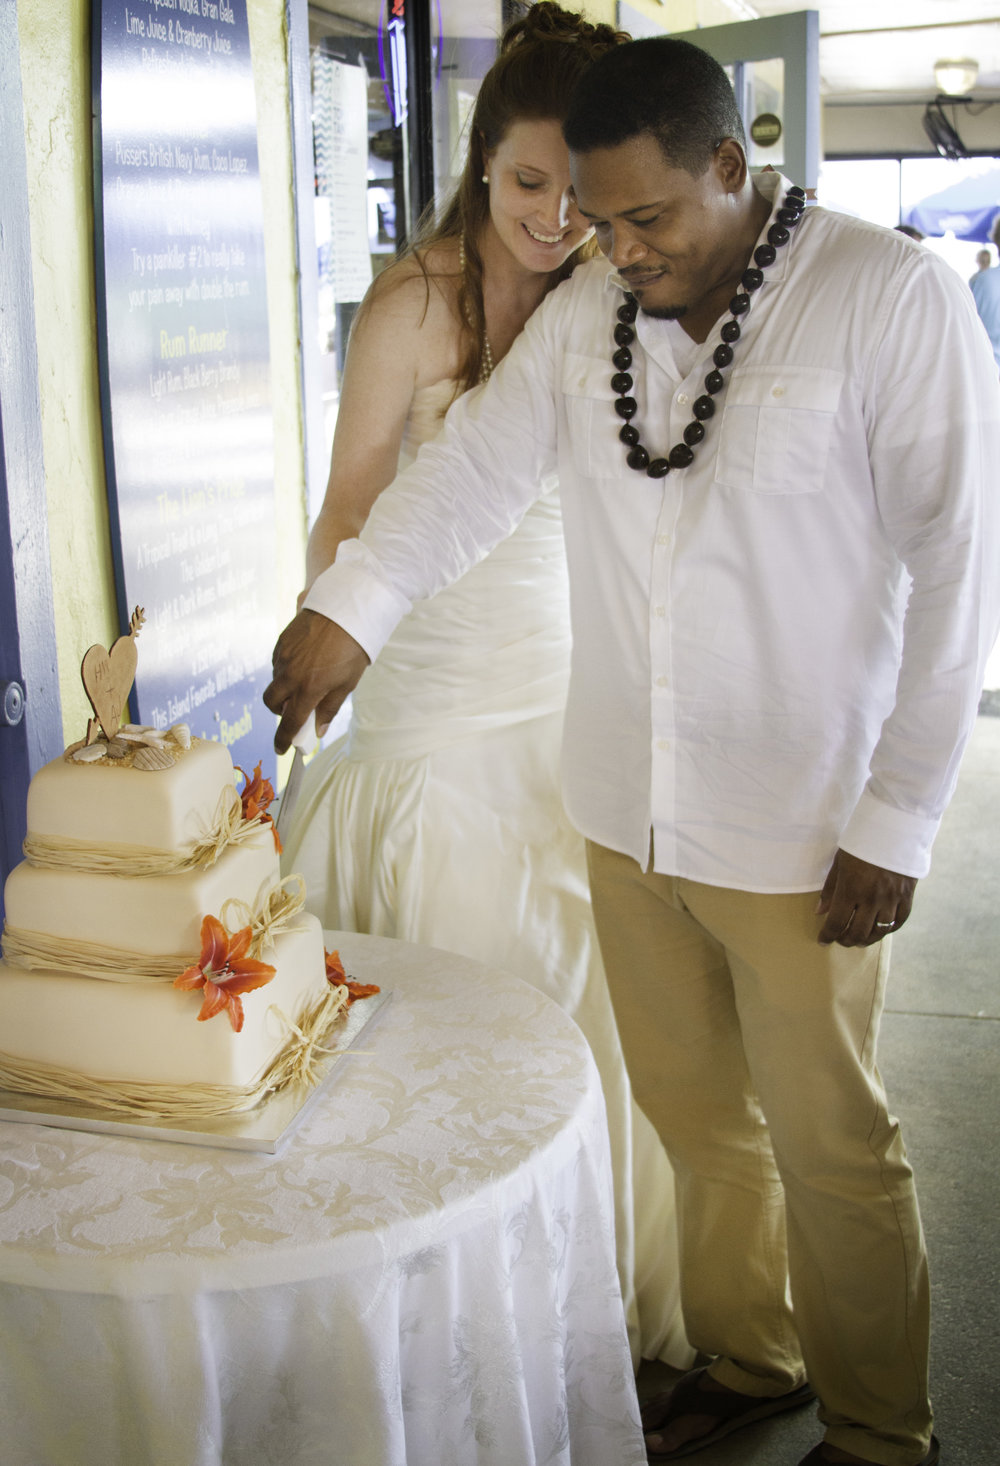 Archie&Heather Cake2.jpg